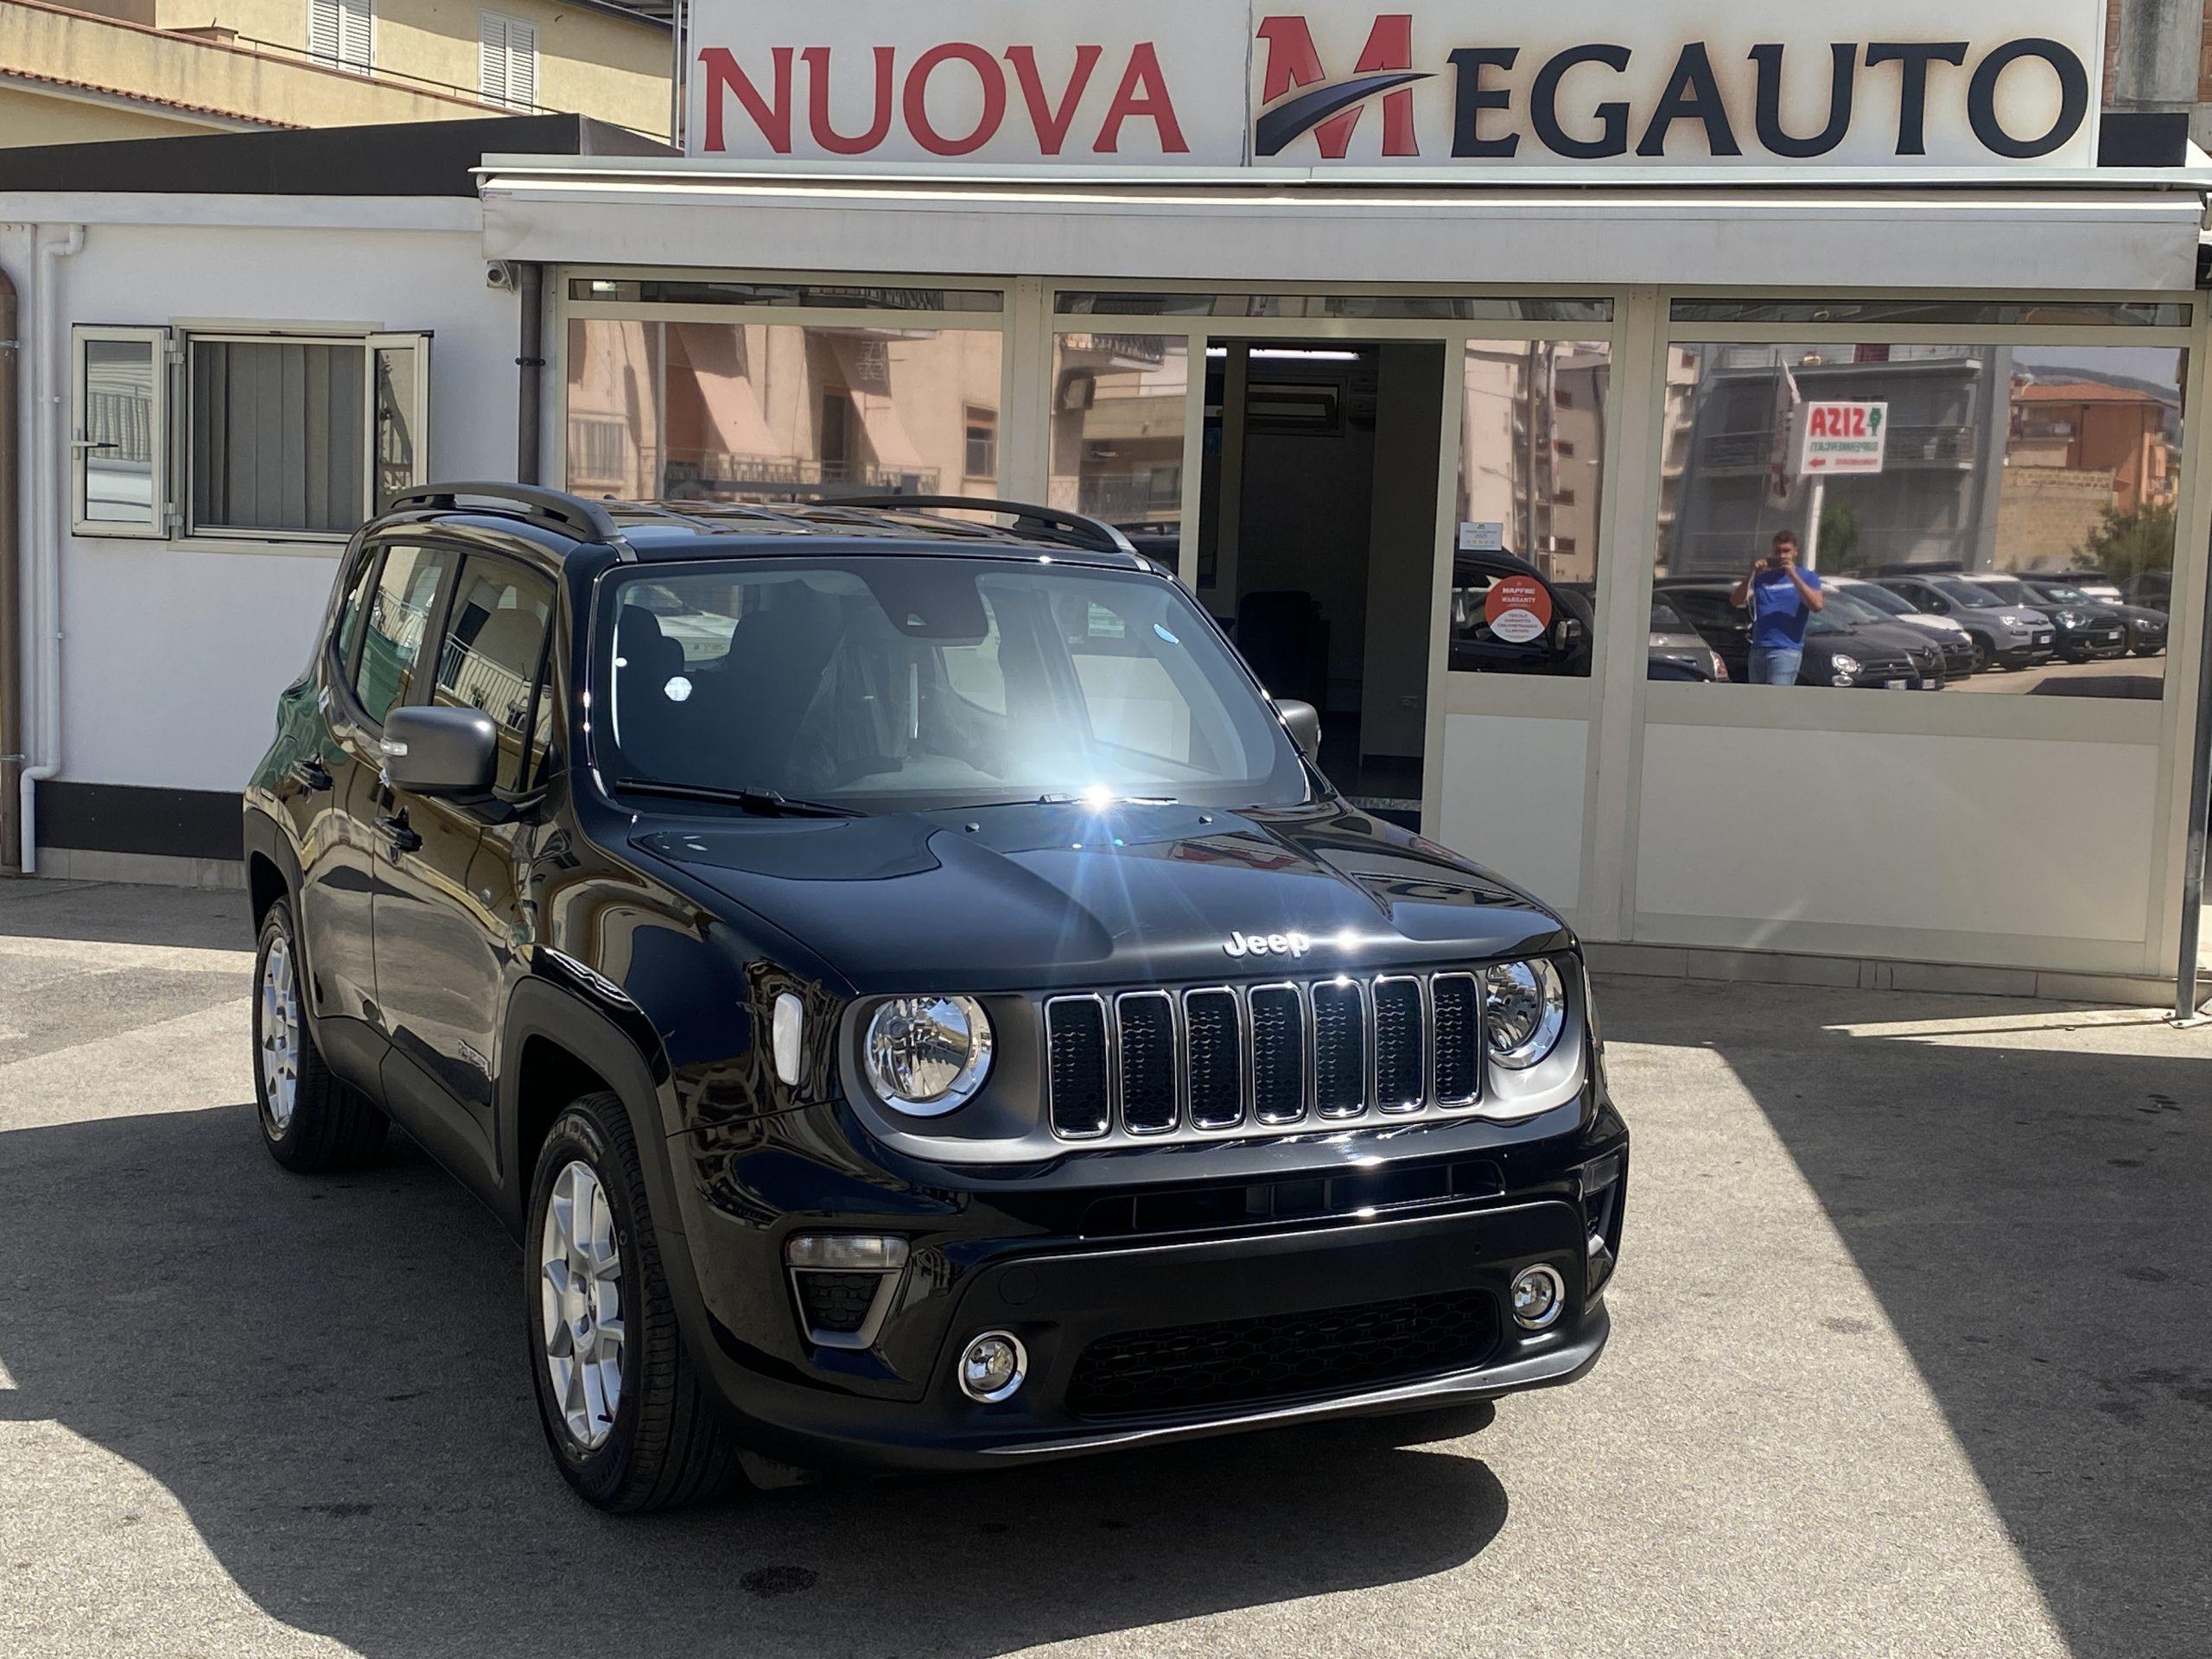 Jeep Renegade 1.6 Mjt LIMITED 130CV My2021 Km0